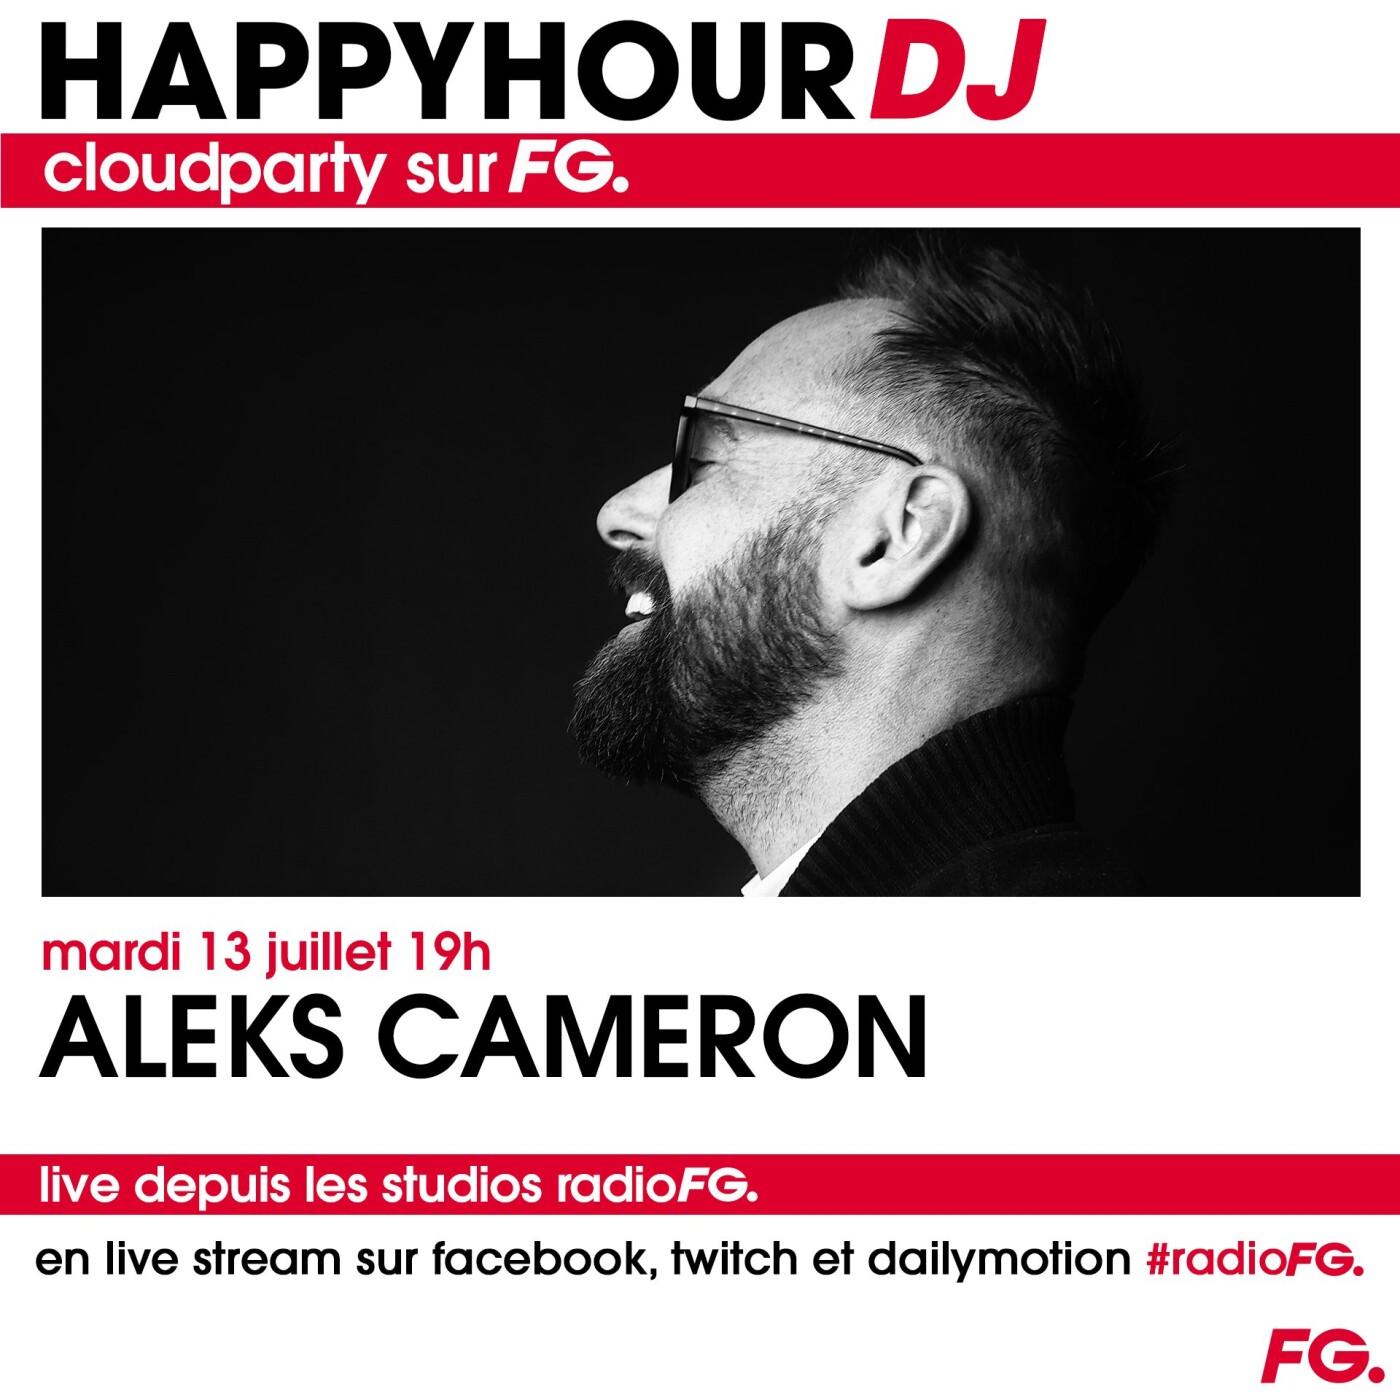 HAPPY HOUR DJ : ALEKS CAMERON